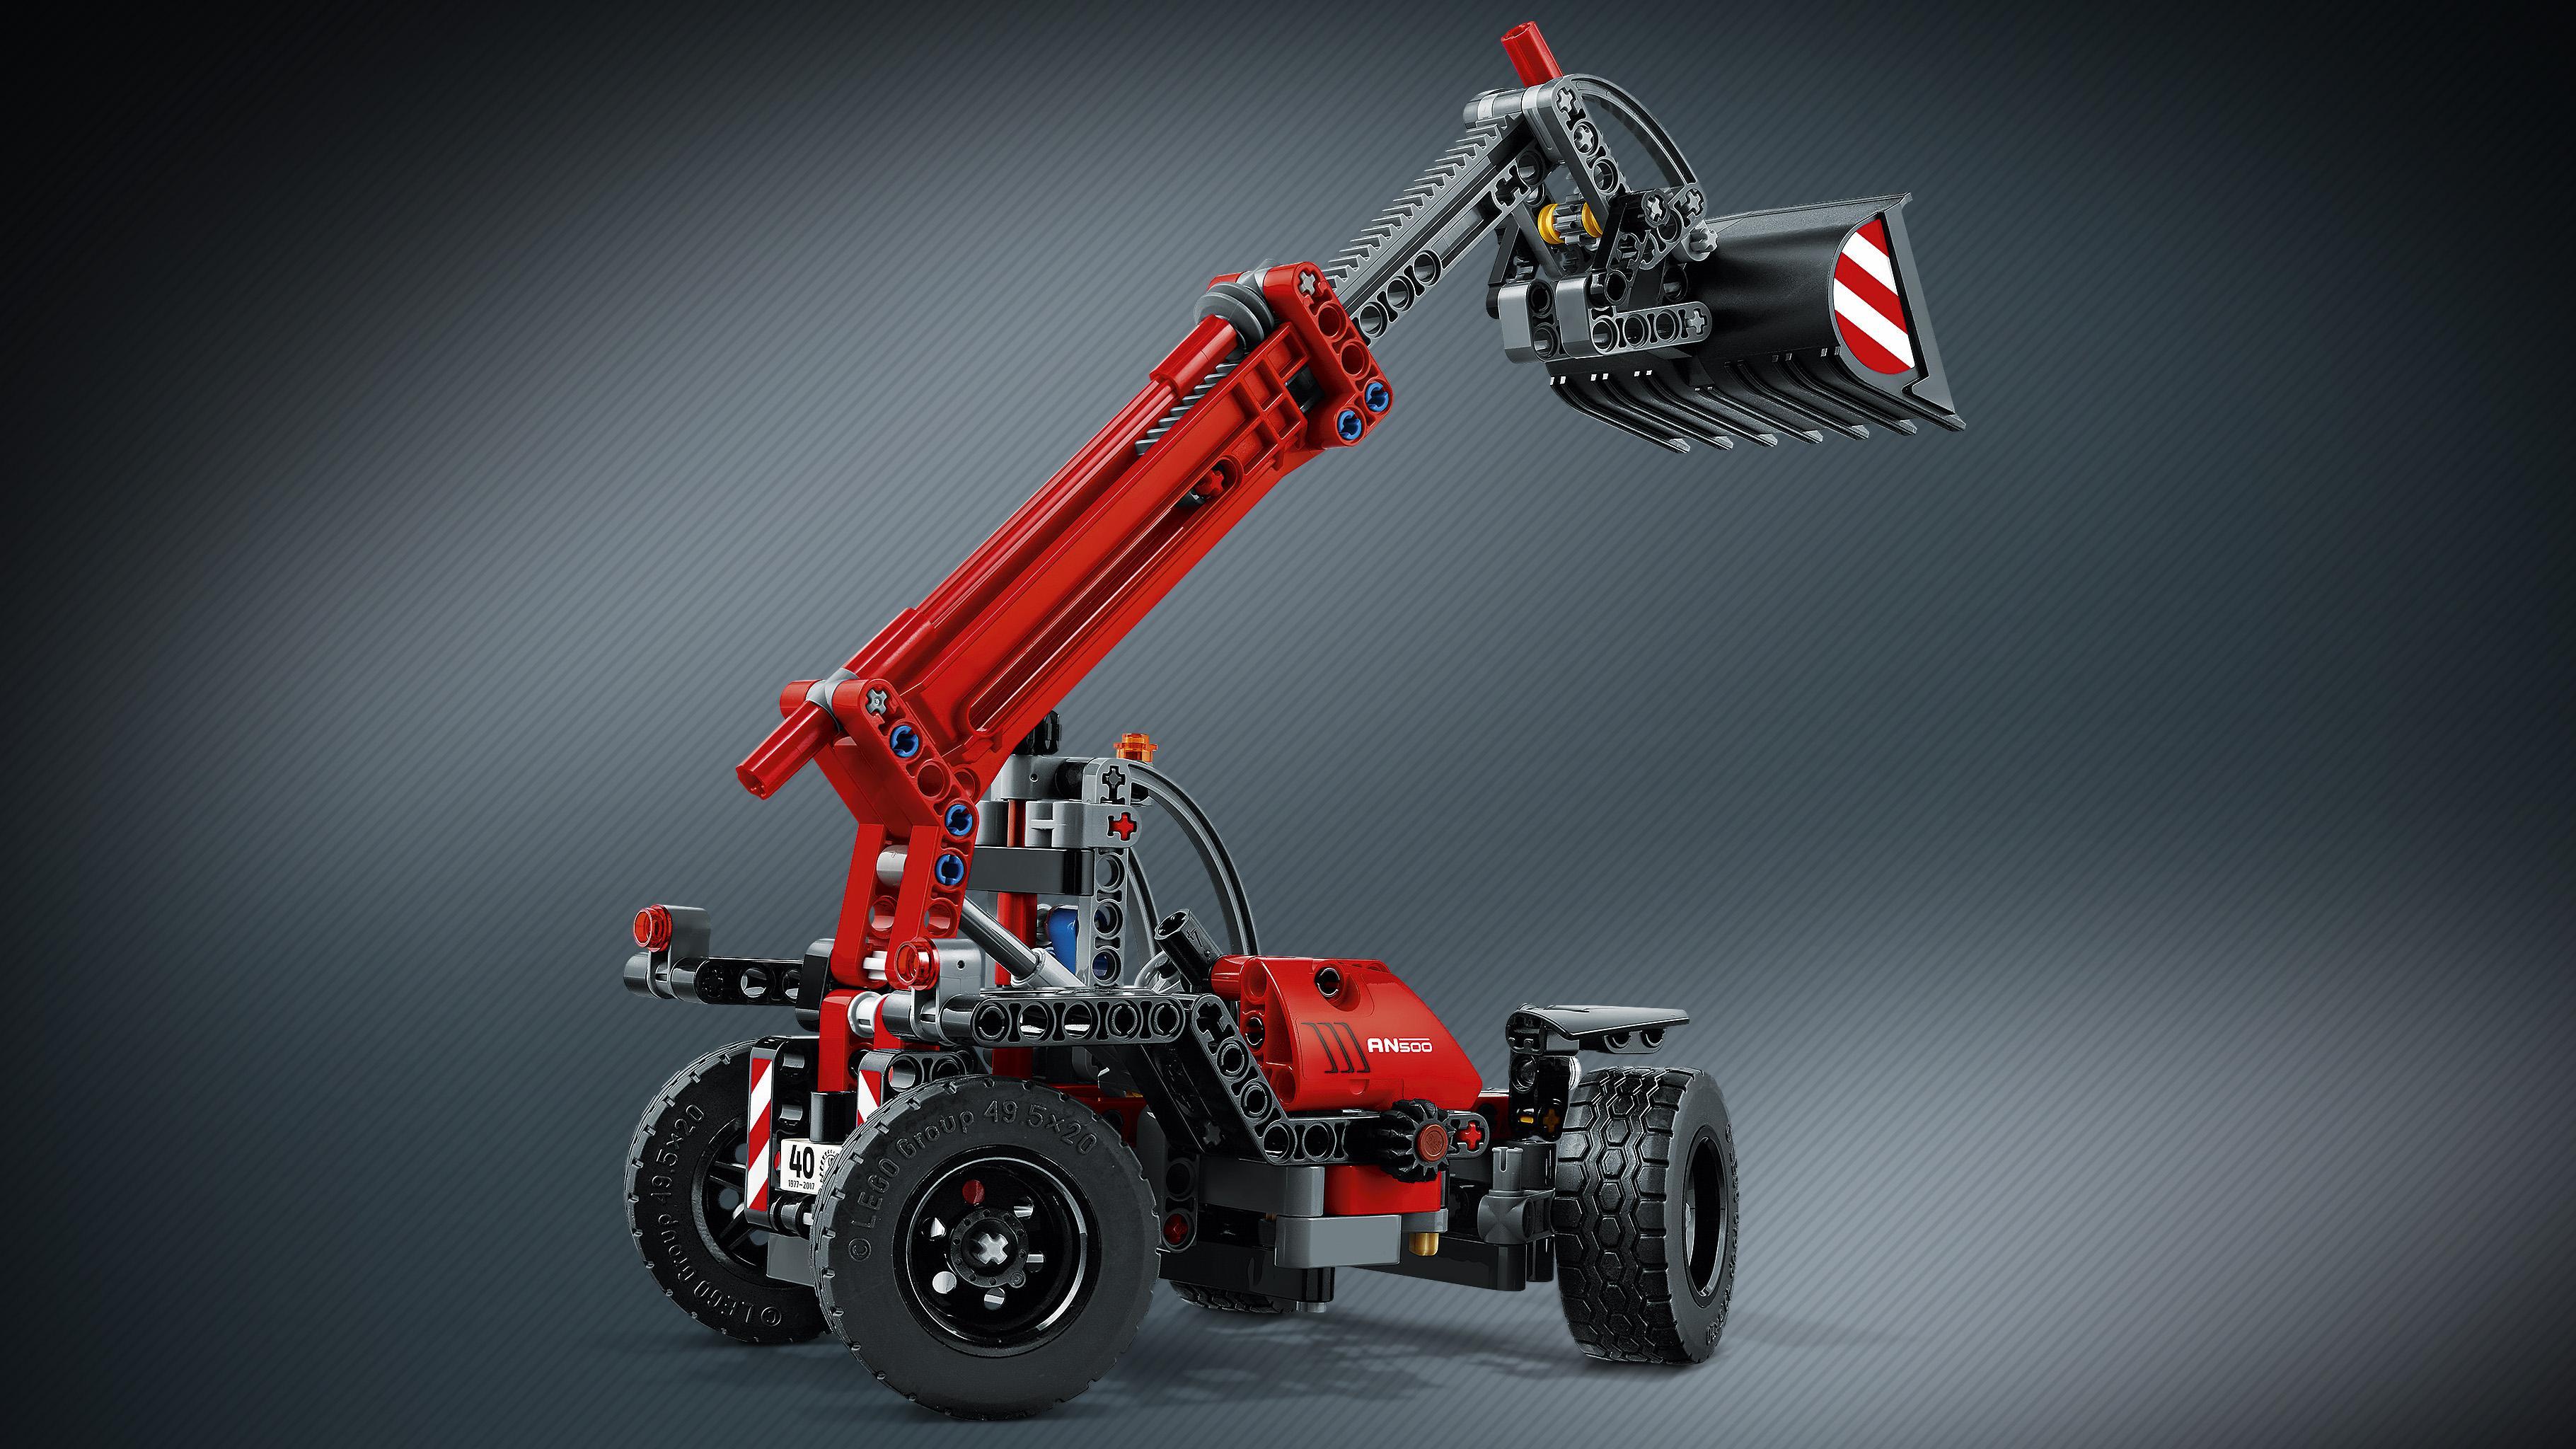 lego technic telehandler 42061 building kit toys games. Black Bedroom Furniture Sets. Home Design Ideas